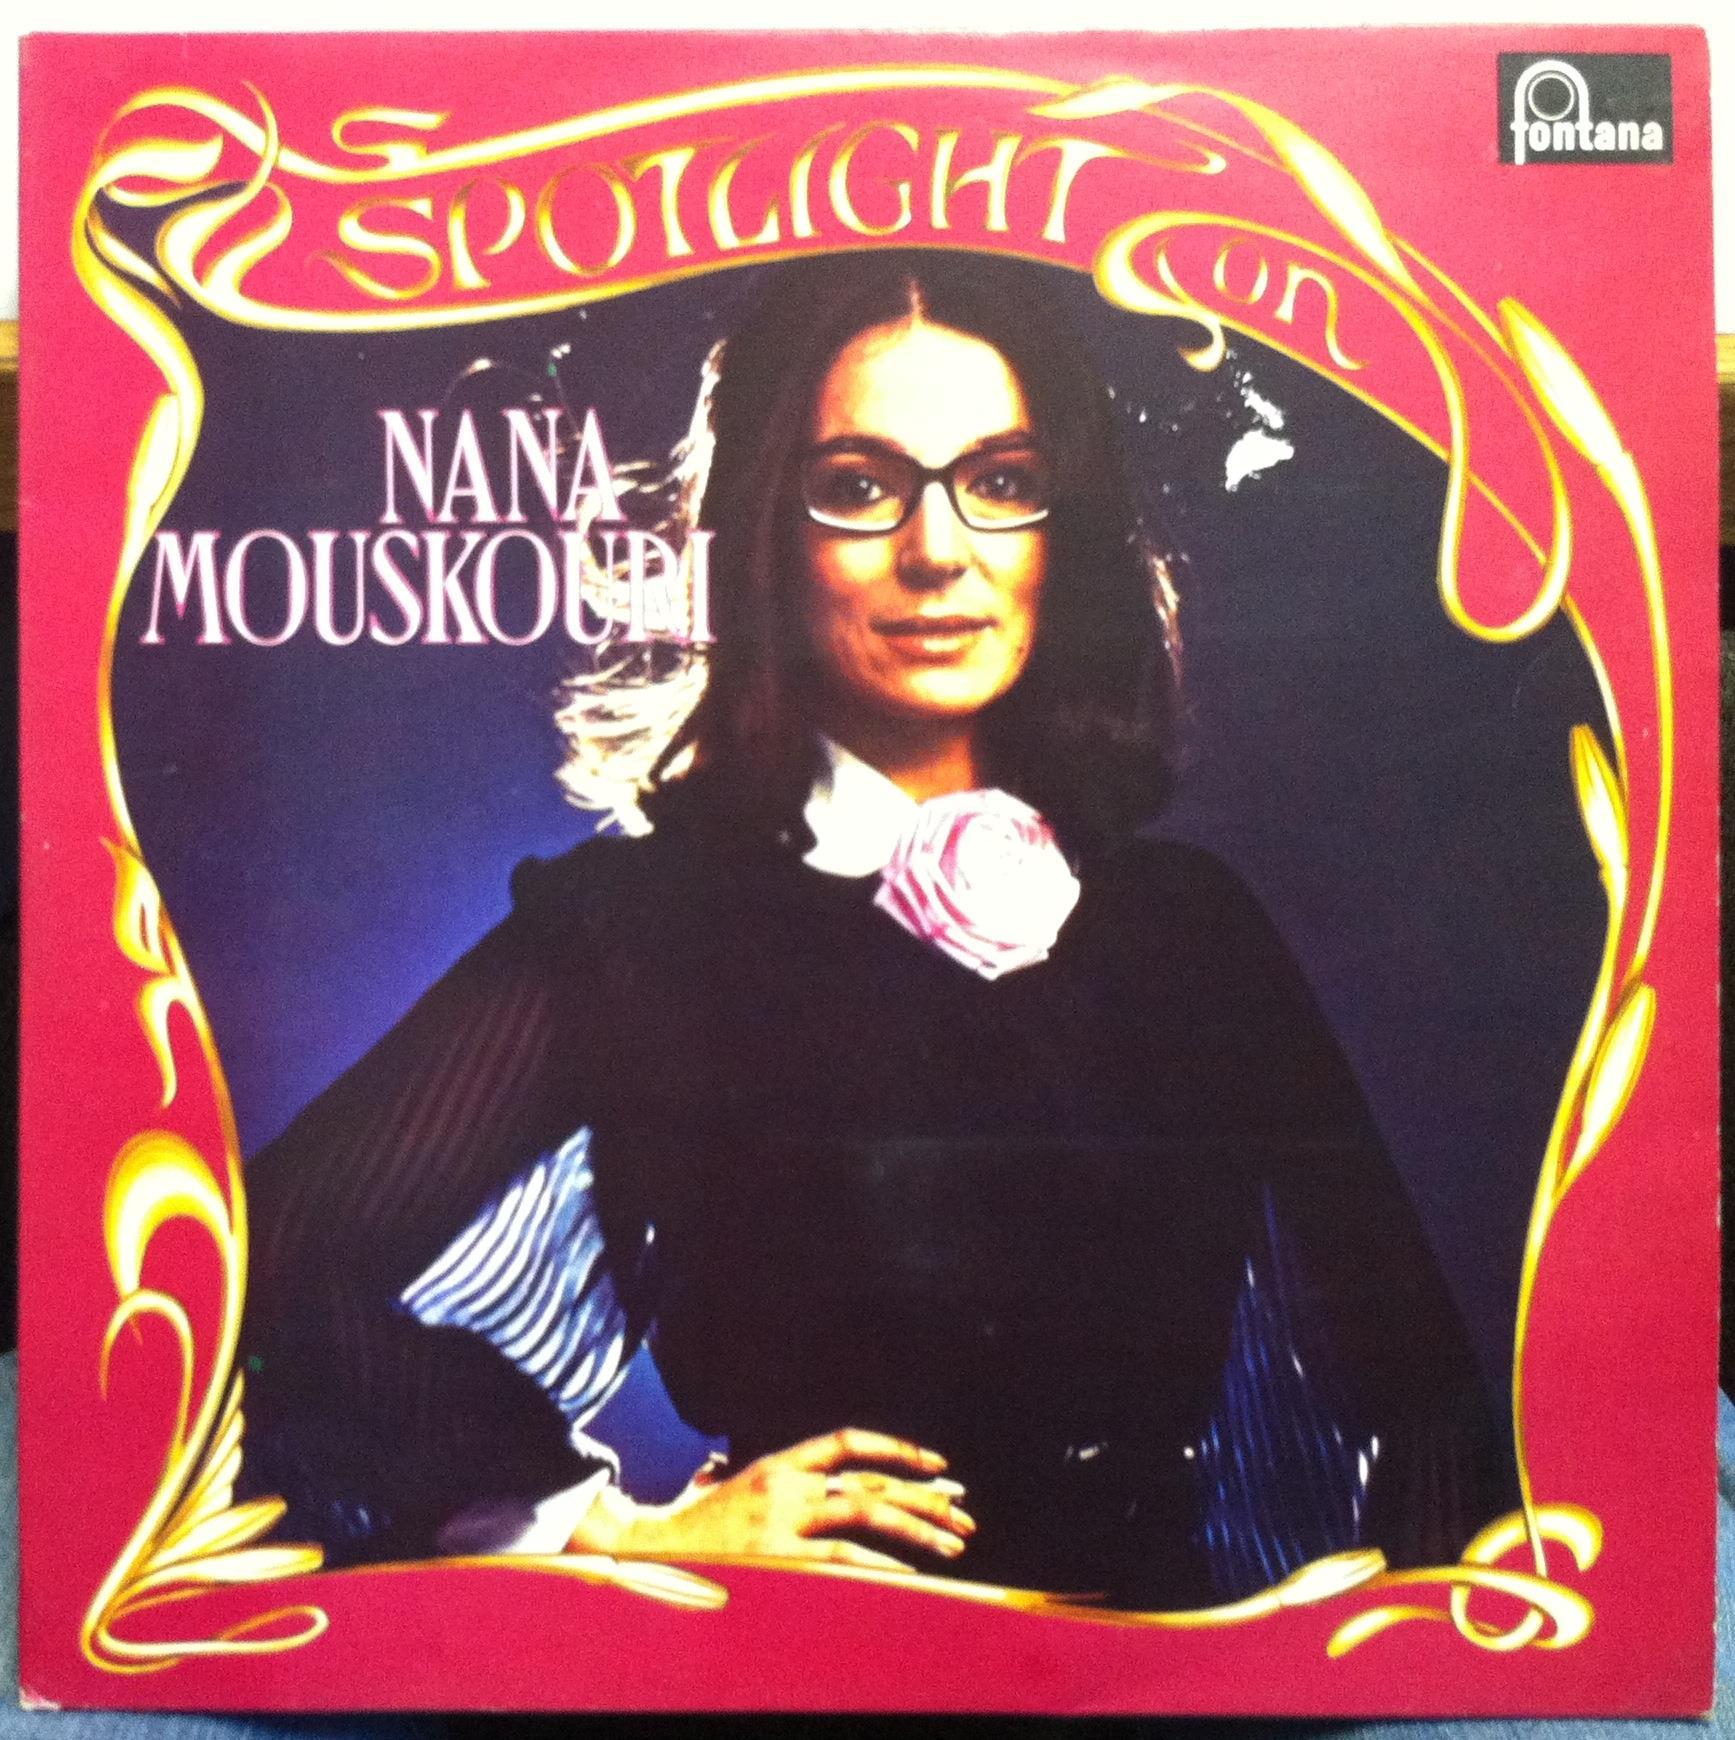 NANA MOUSKOURI - Spotlight On Record